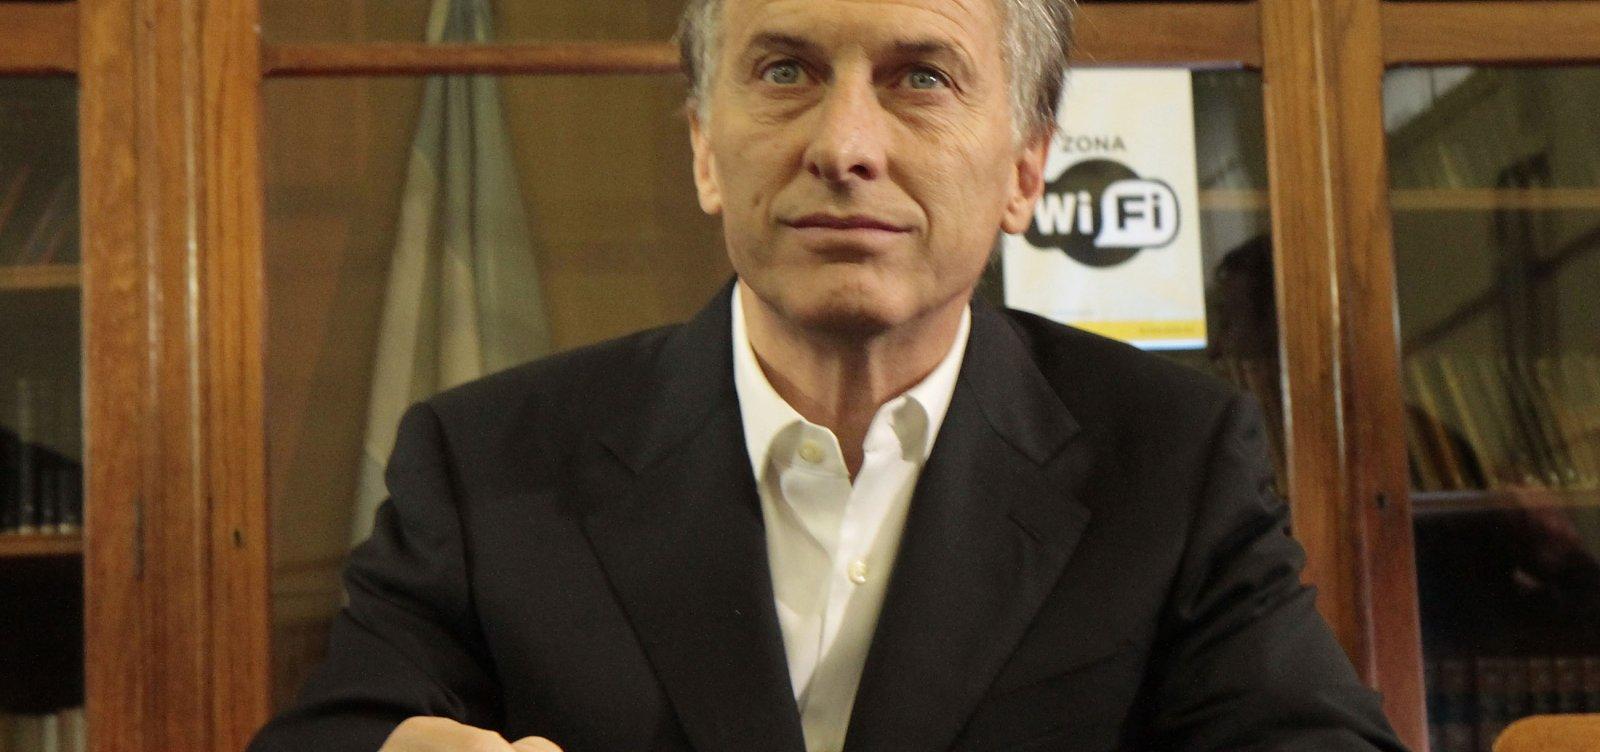 Argentina decide deixar Unasul